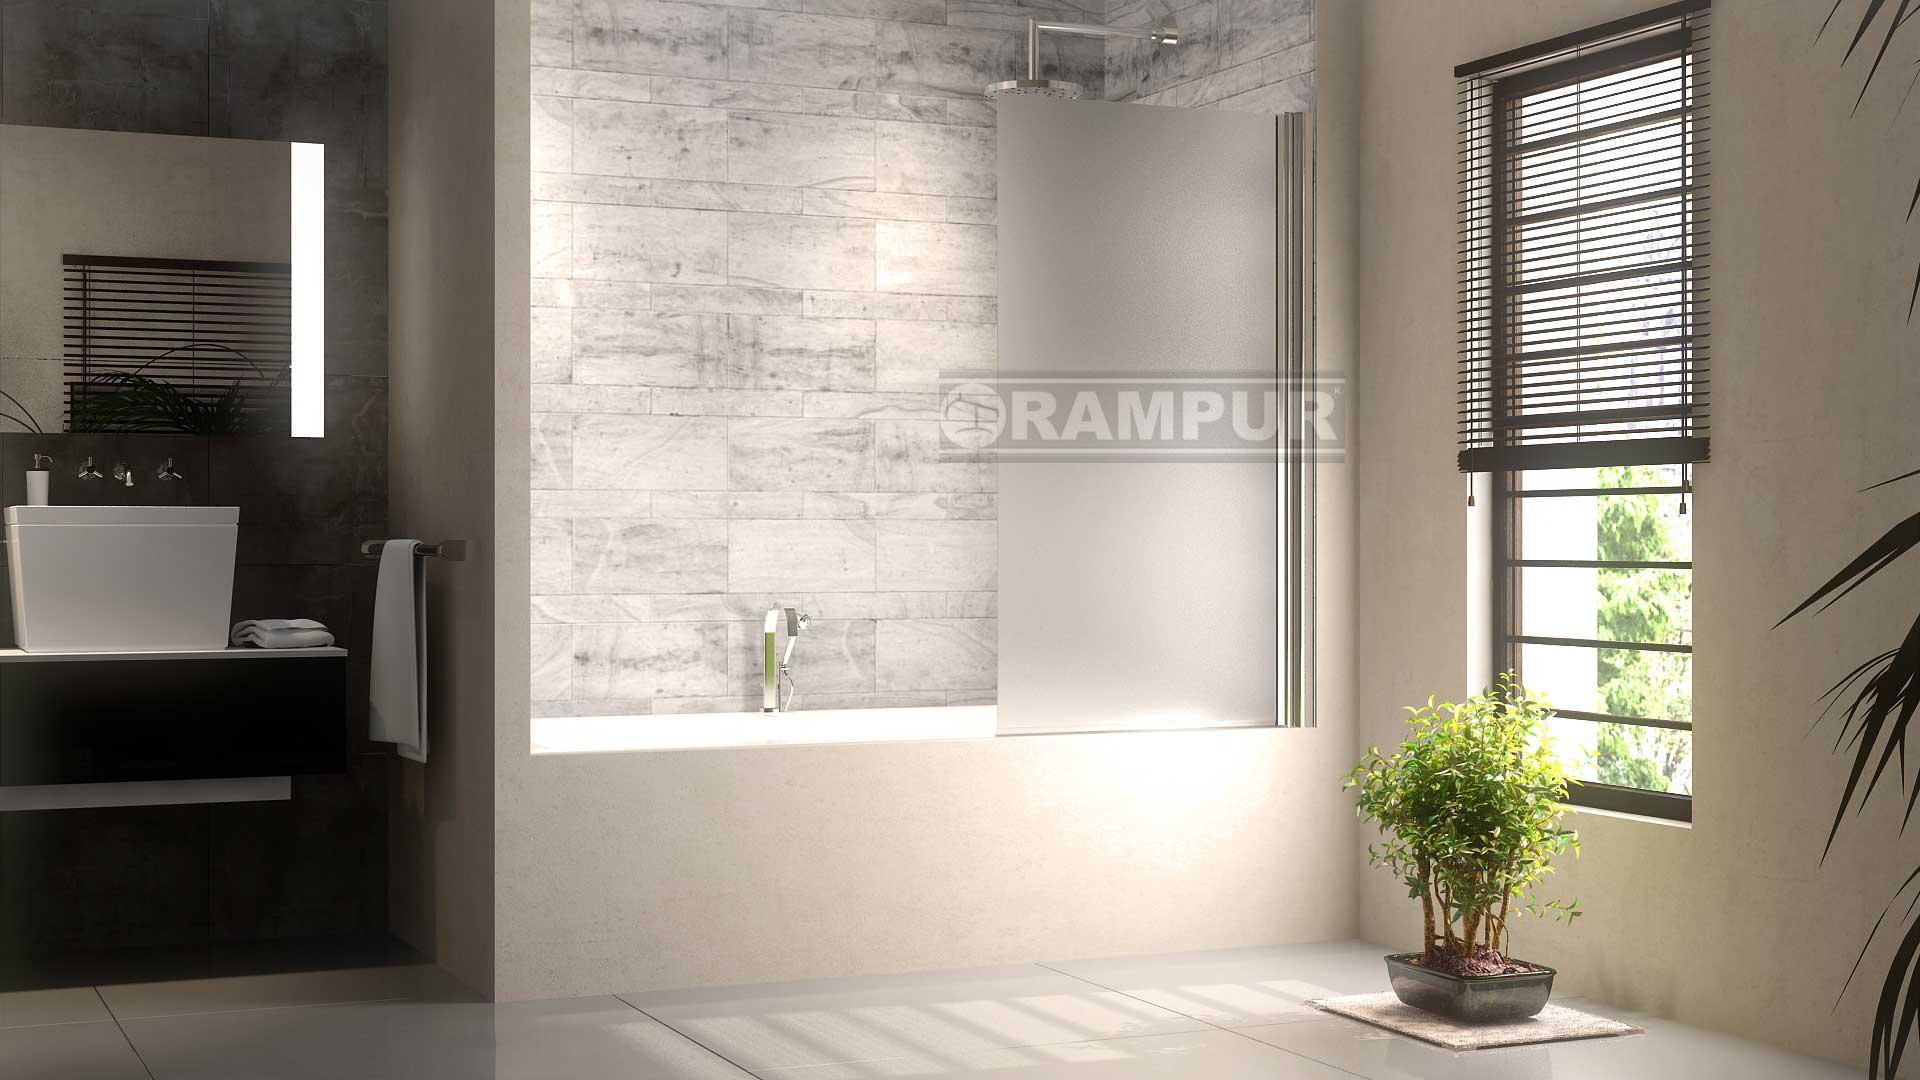 Puerta Baño Hacia Afuera:RAMPUR® Mampara Baño Rebatible Vidrio IGUAZU Premium